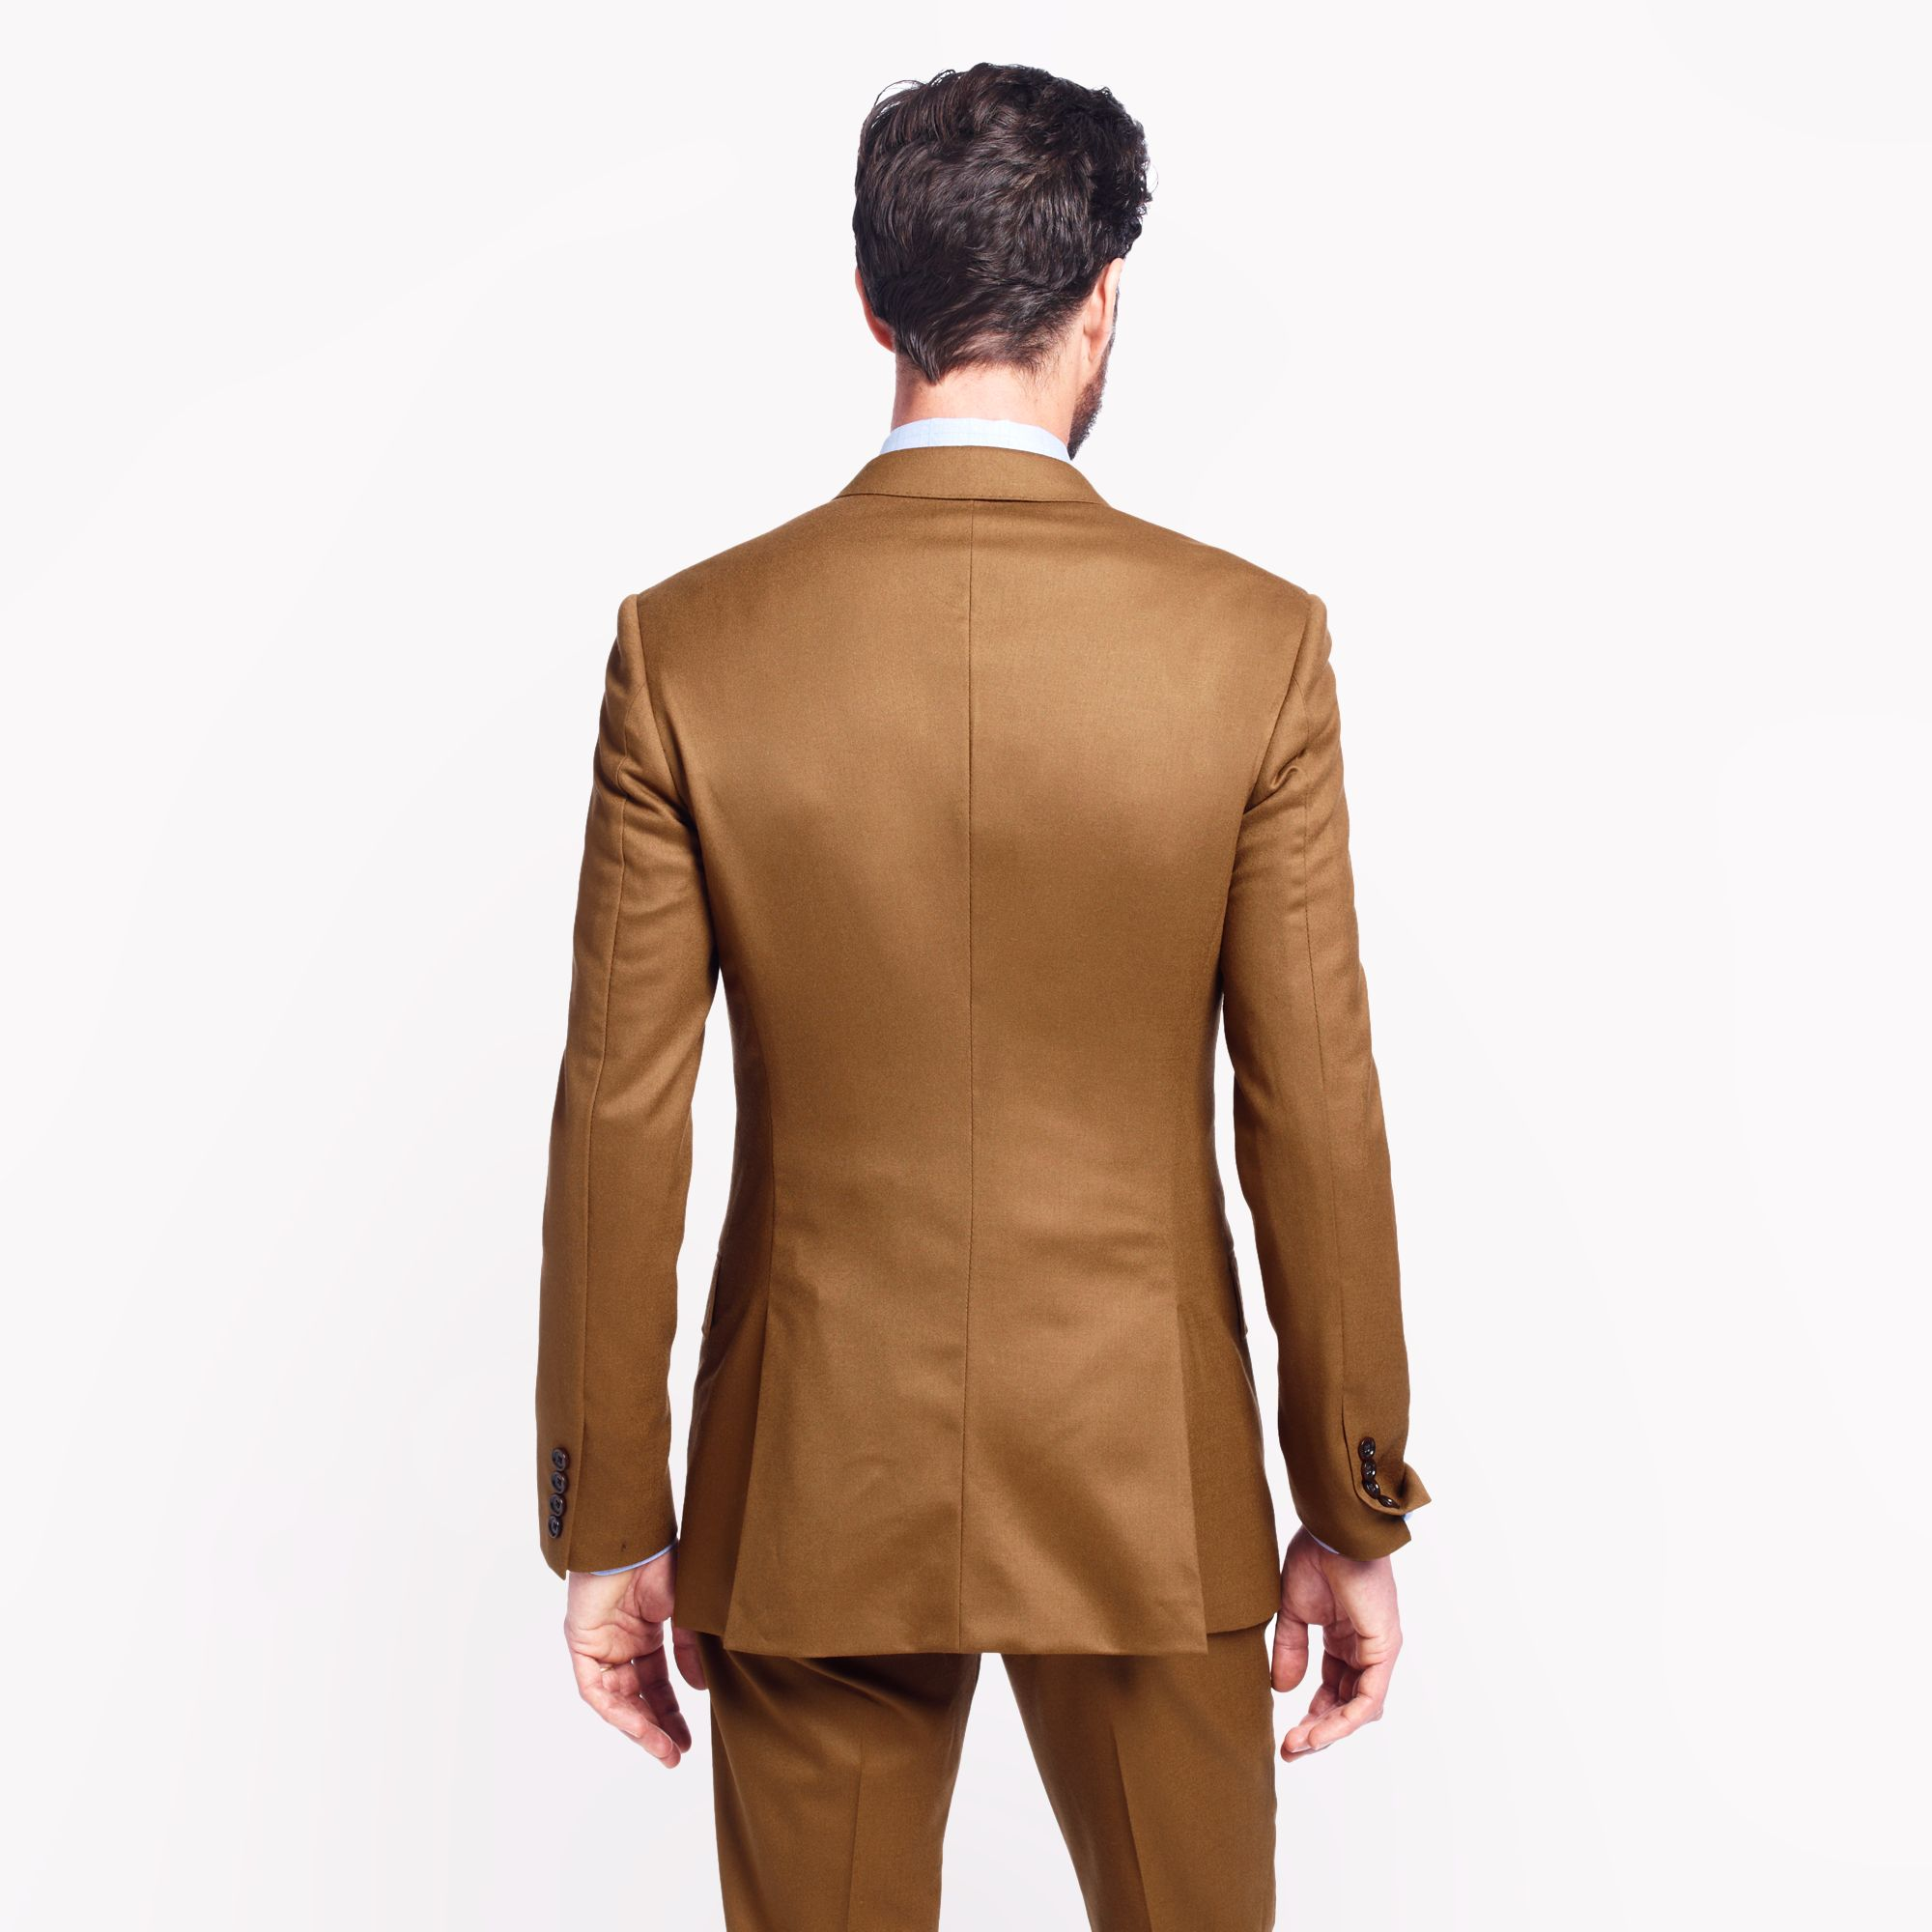 J.Crew Ludlow Suit Pant In Italian Wool Flannel in Brown for Men